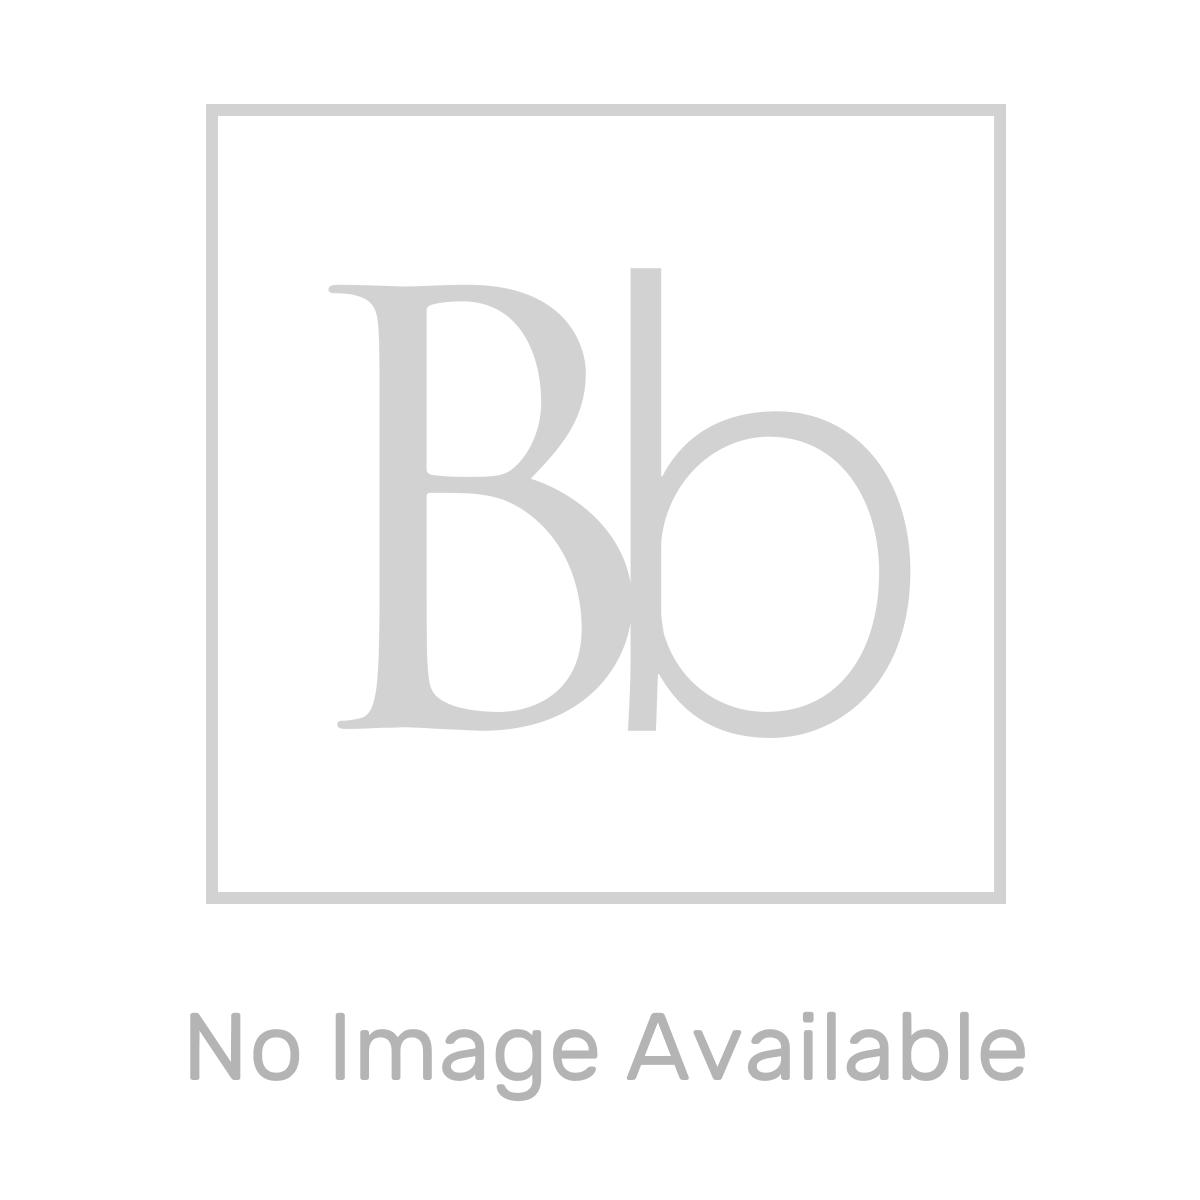 Vitra Neon Double Ended Bath